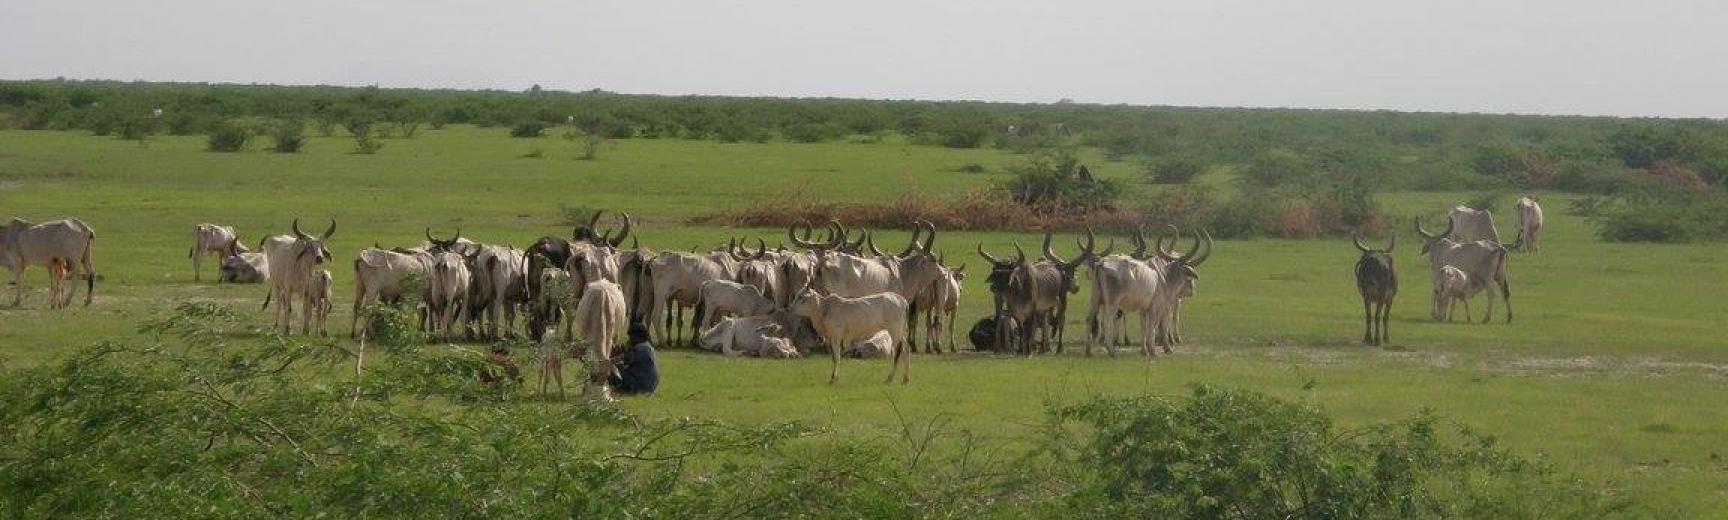 cows graze on grassland in western india